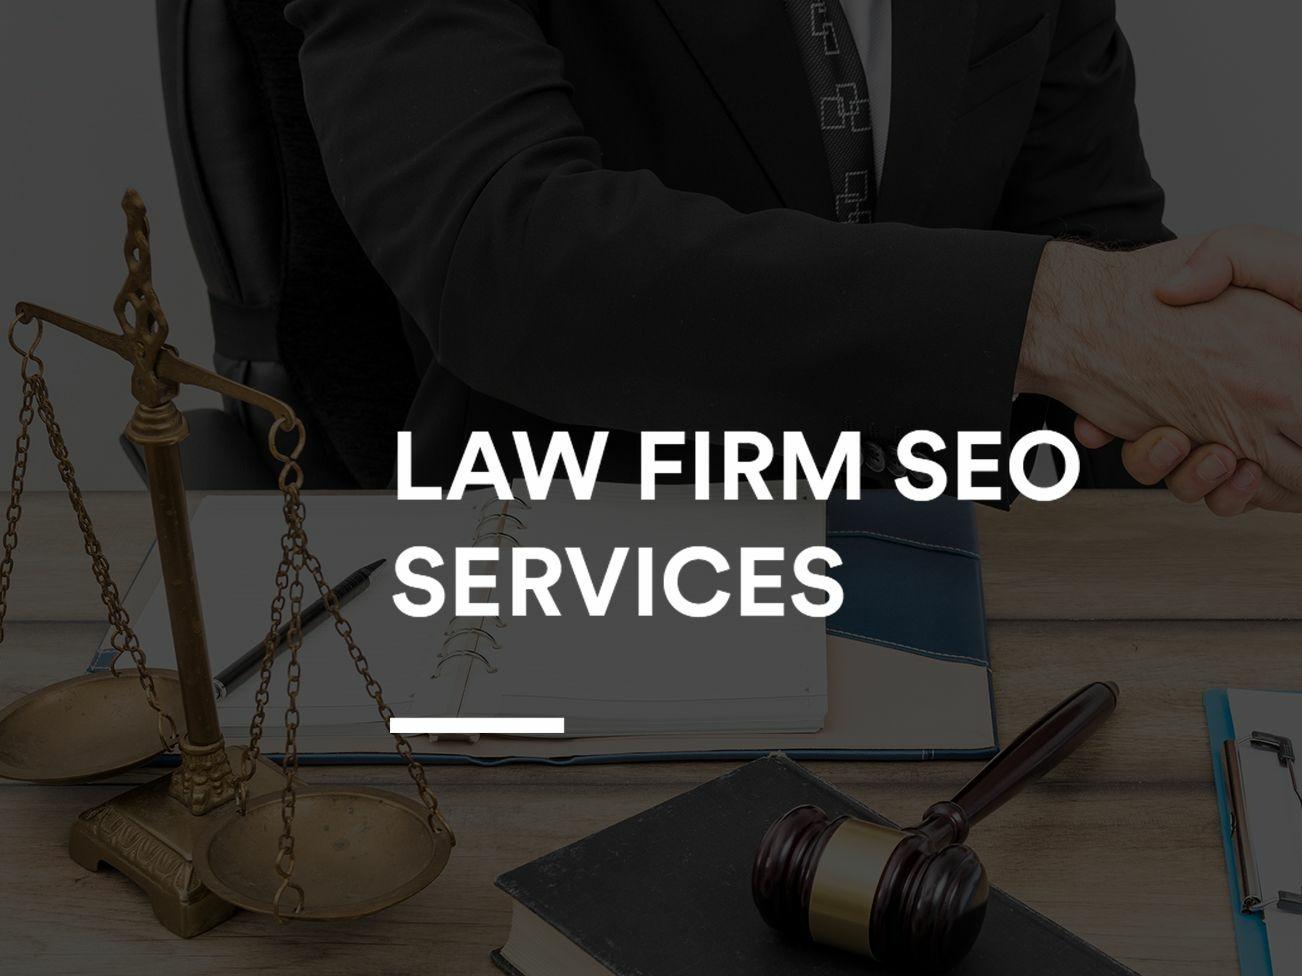 Law Firm SEO Services Website UI marketing web design branding law firm seo